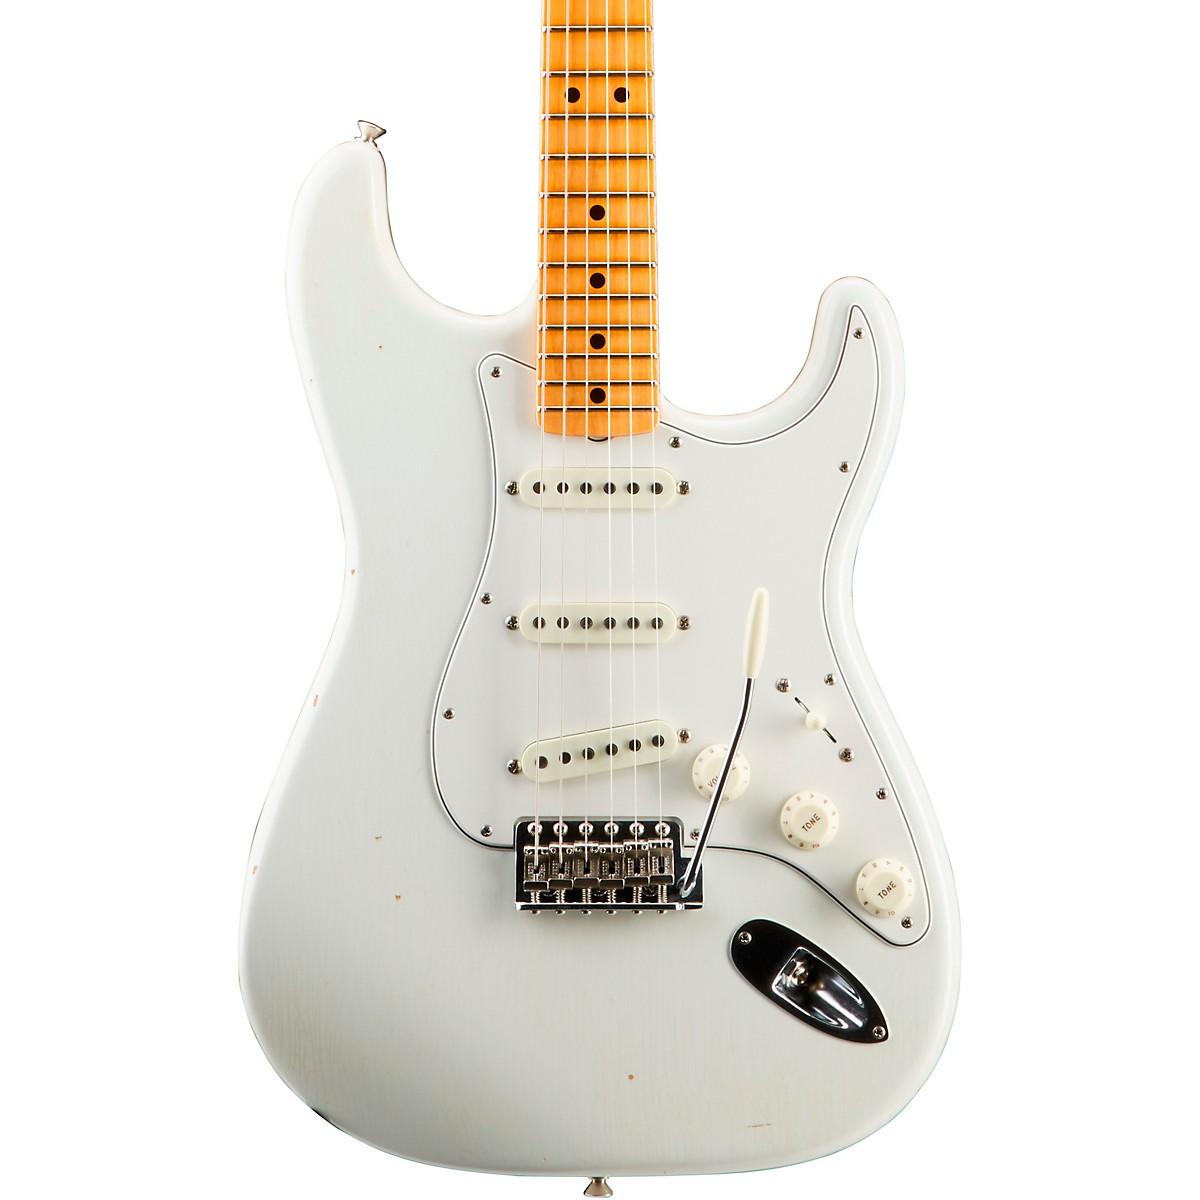 Fender Custom Shop Jimi Hendrix Voodoo Child Journeyman Relic Stratocaster Electric Guitar